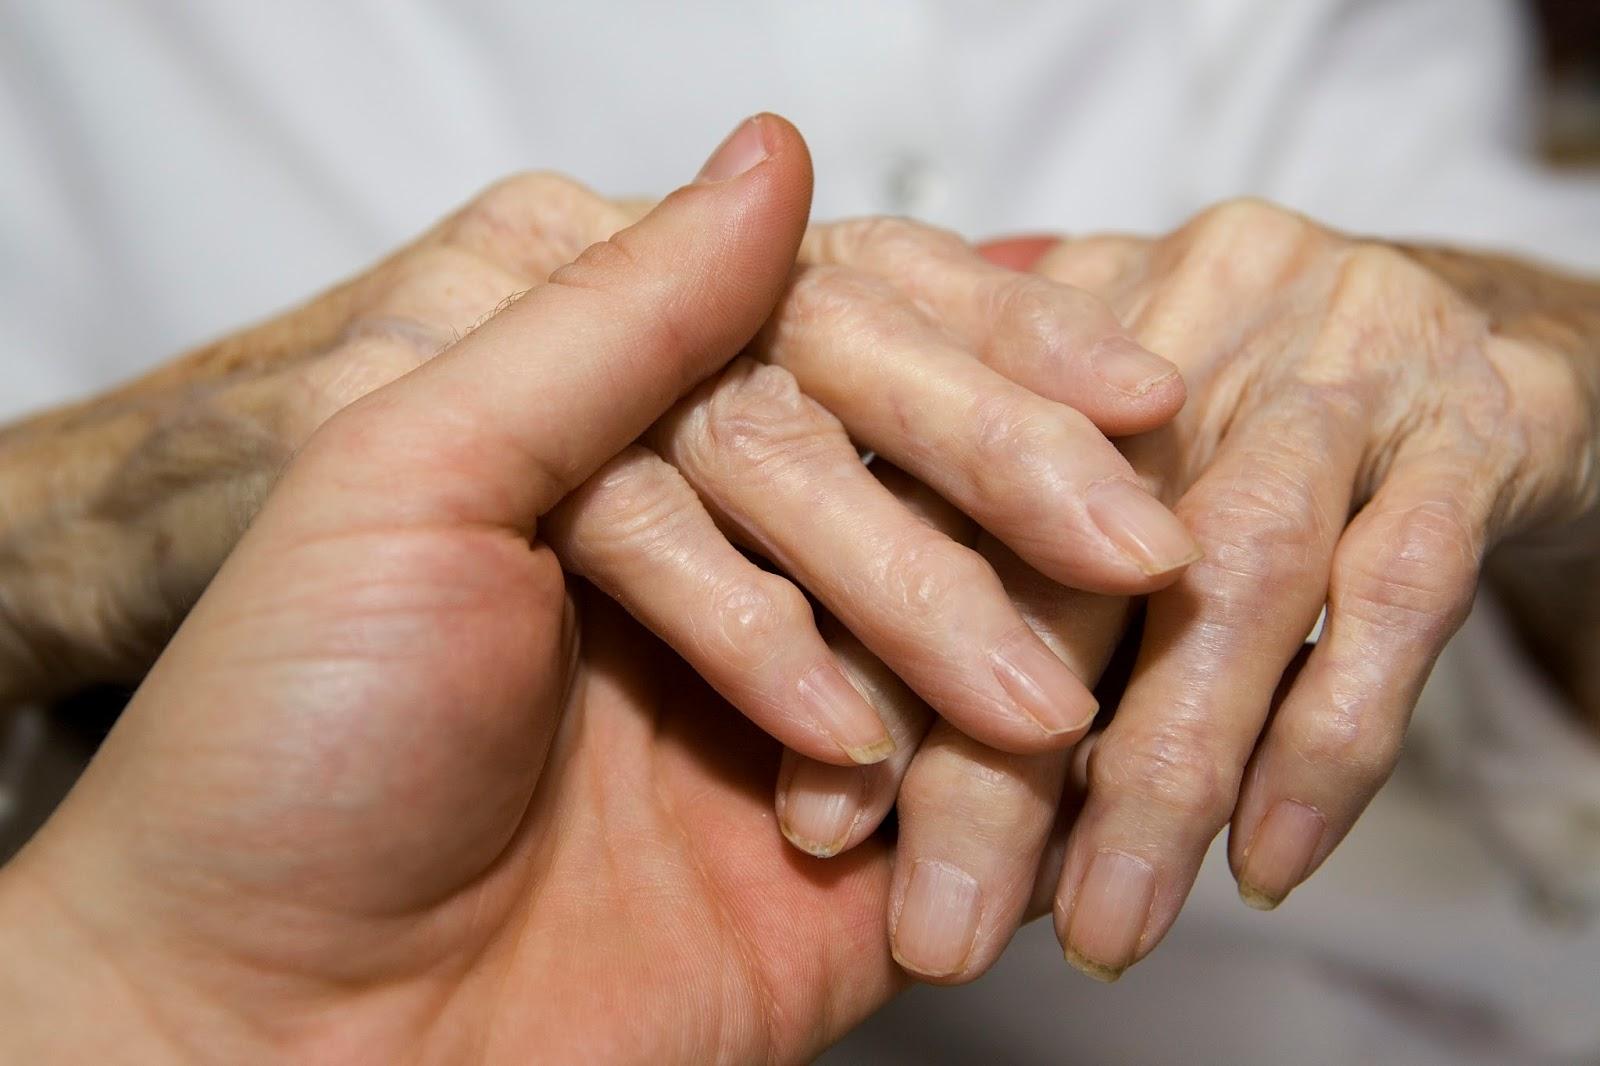 Первая стадия артрита на руках фото